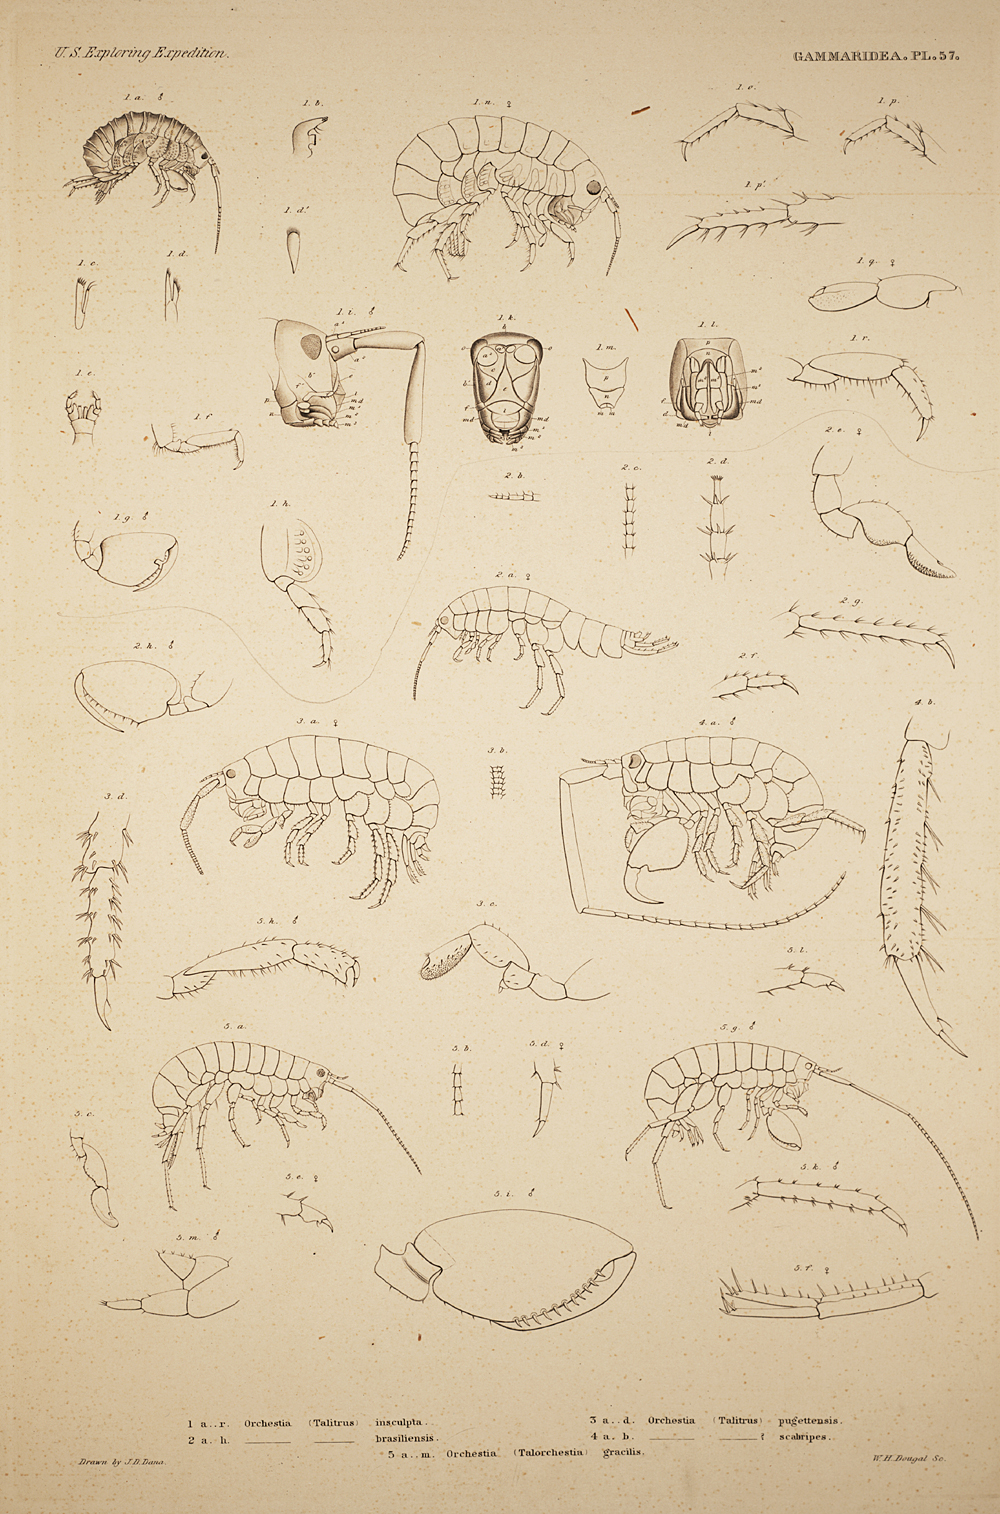 Gammaridea. Pl. 57,  Image number:SIL19-21-147b